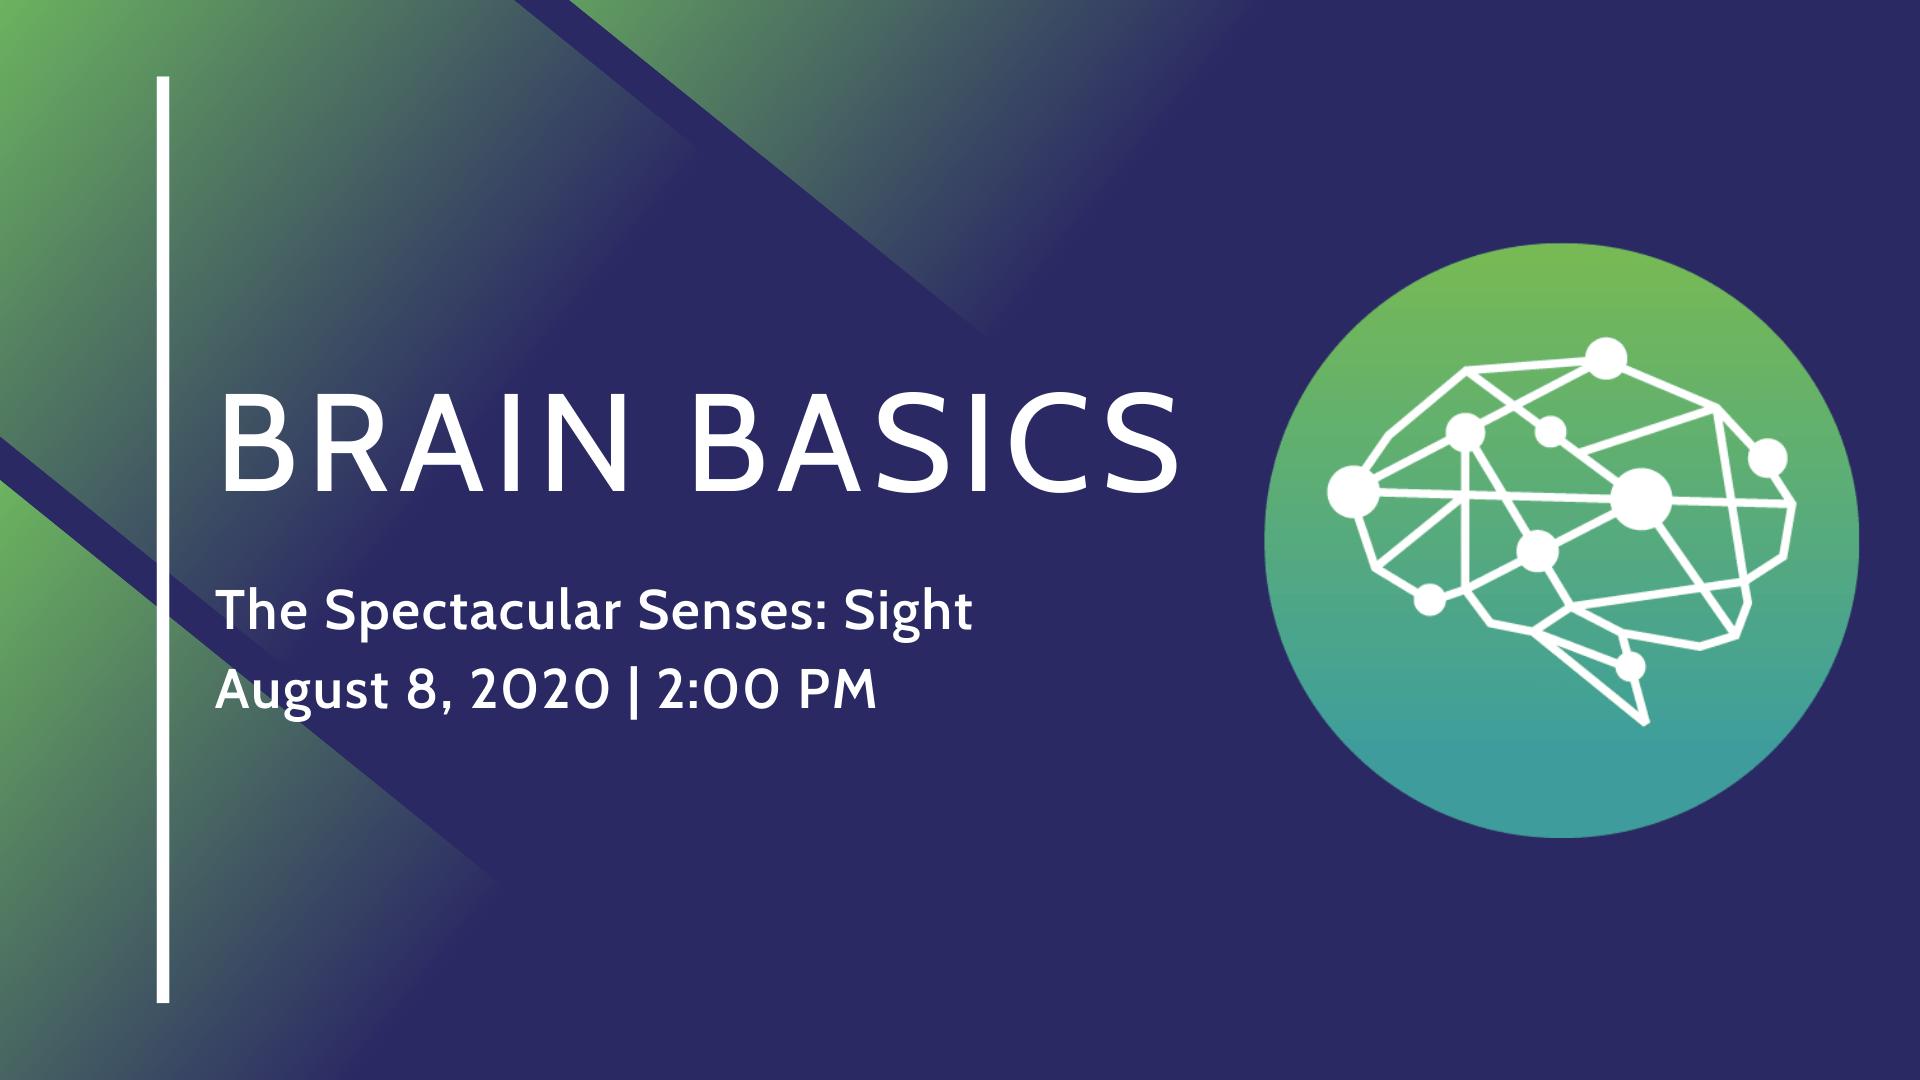 Brain Basics_The Spectacular Senses: Sight